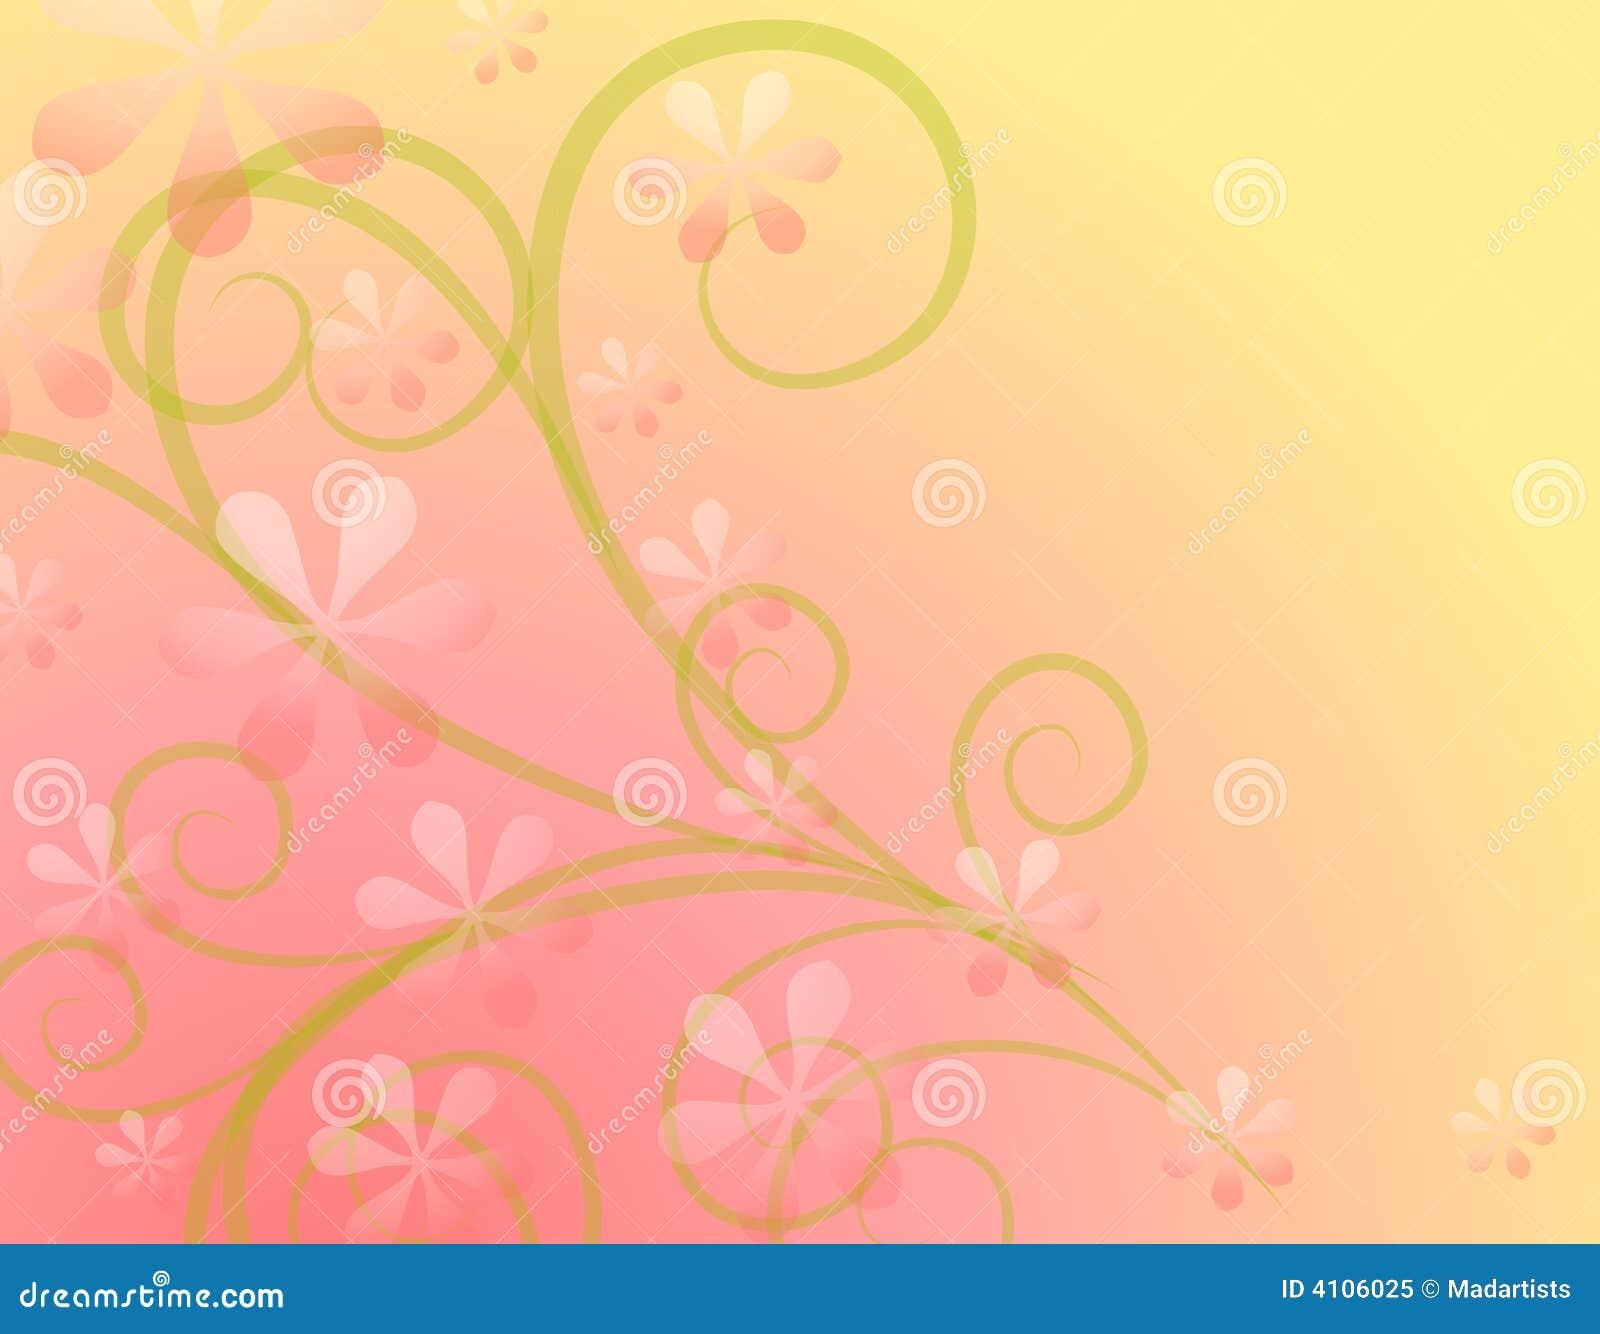 Spring Flowers Soft Pink Background Stock Illustration